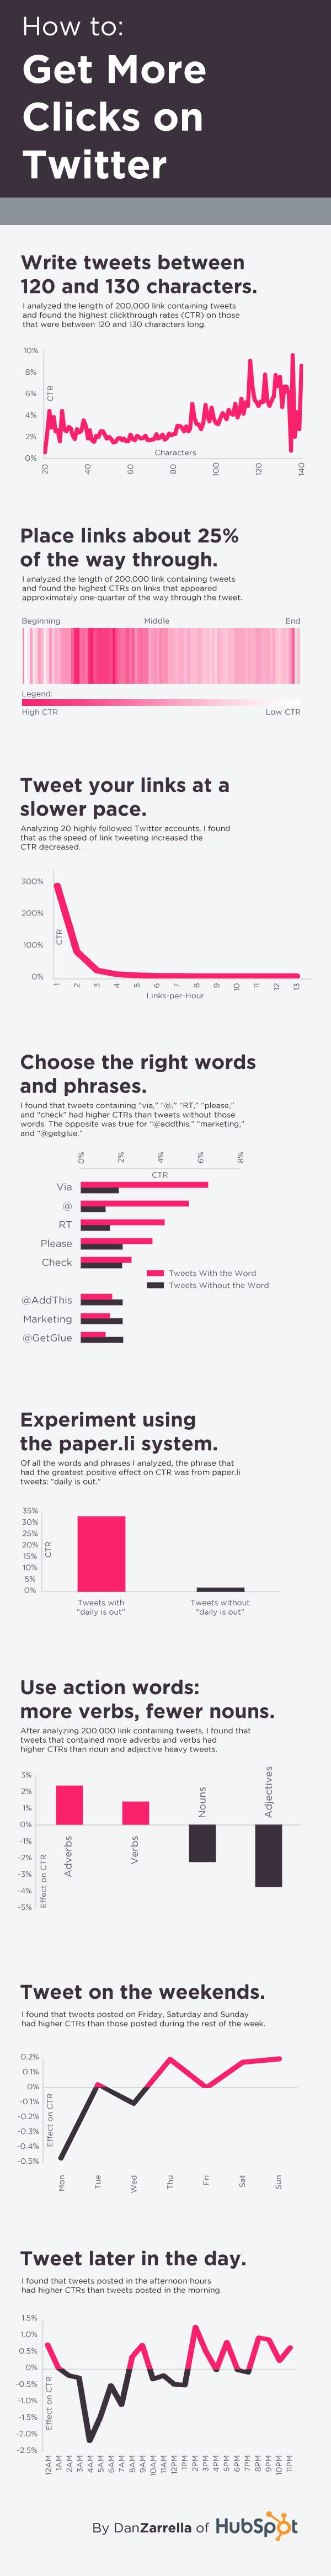 ctr_infographic